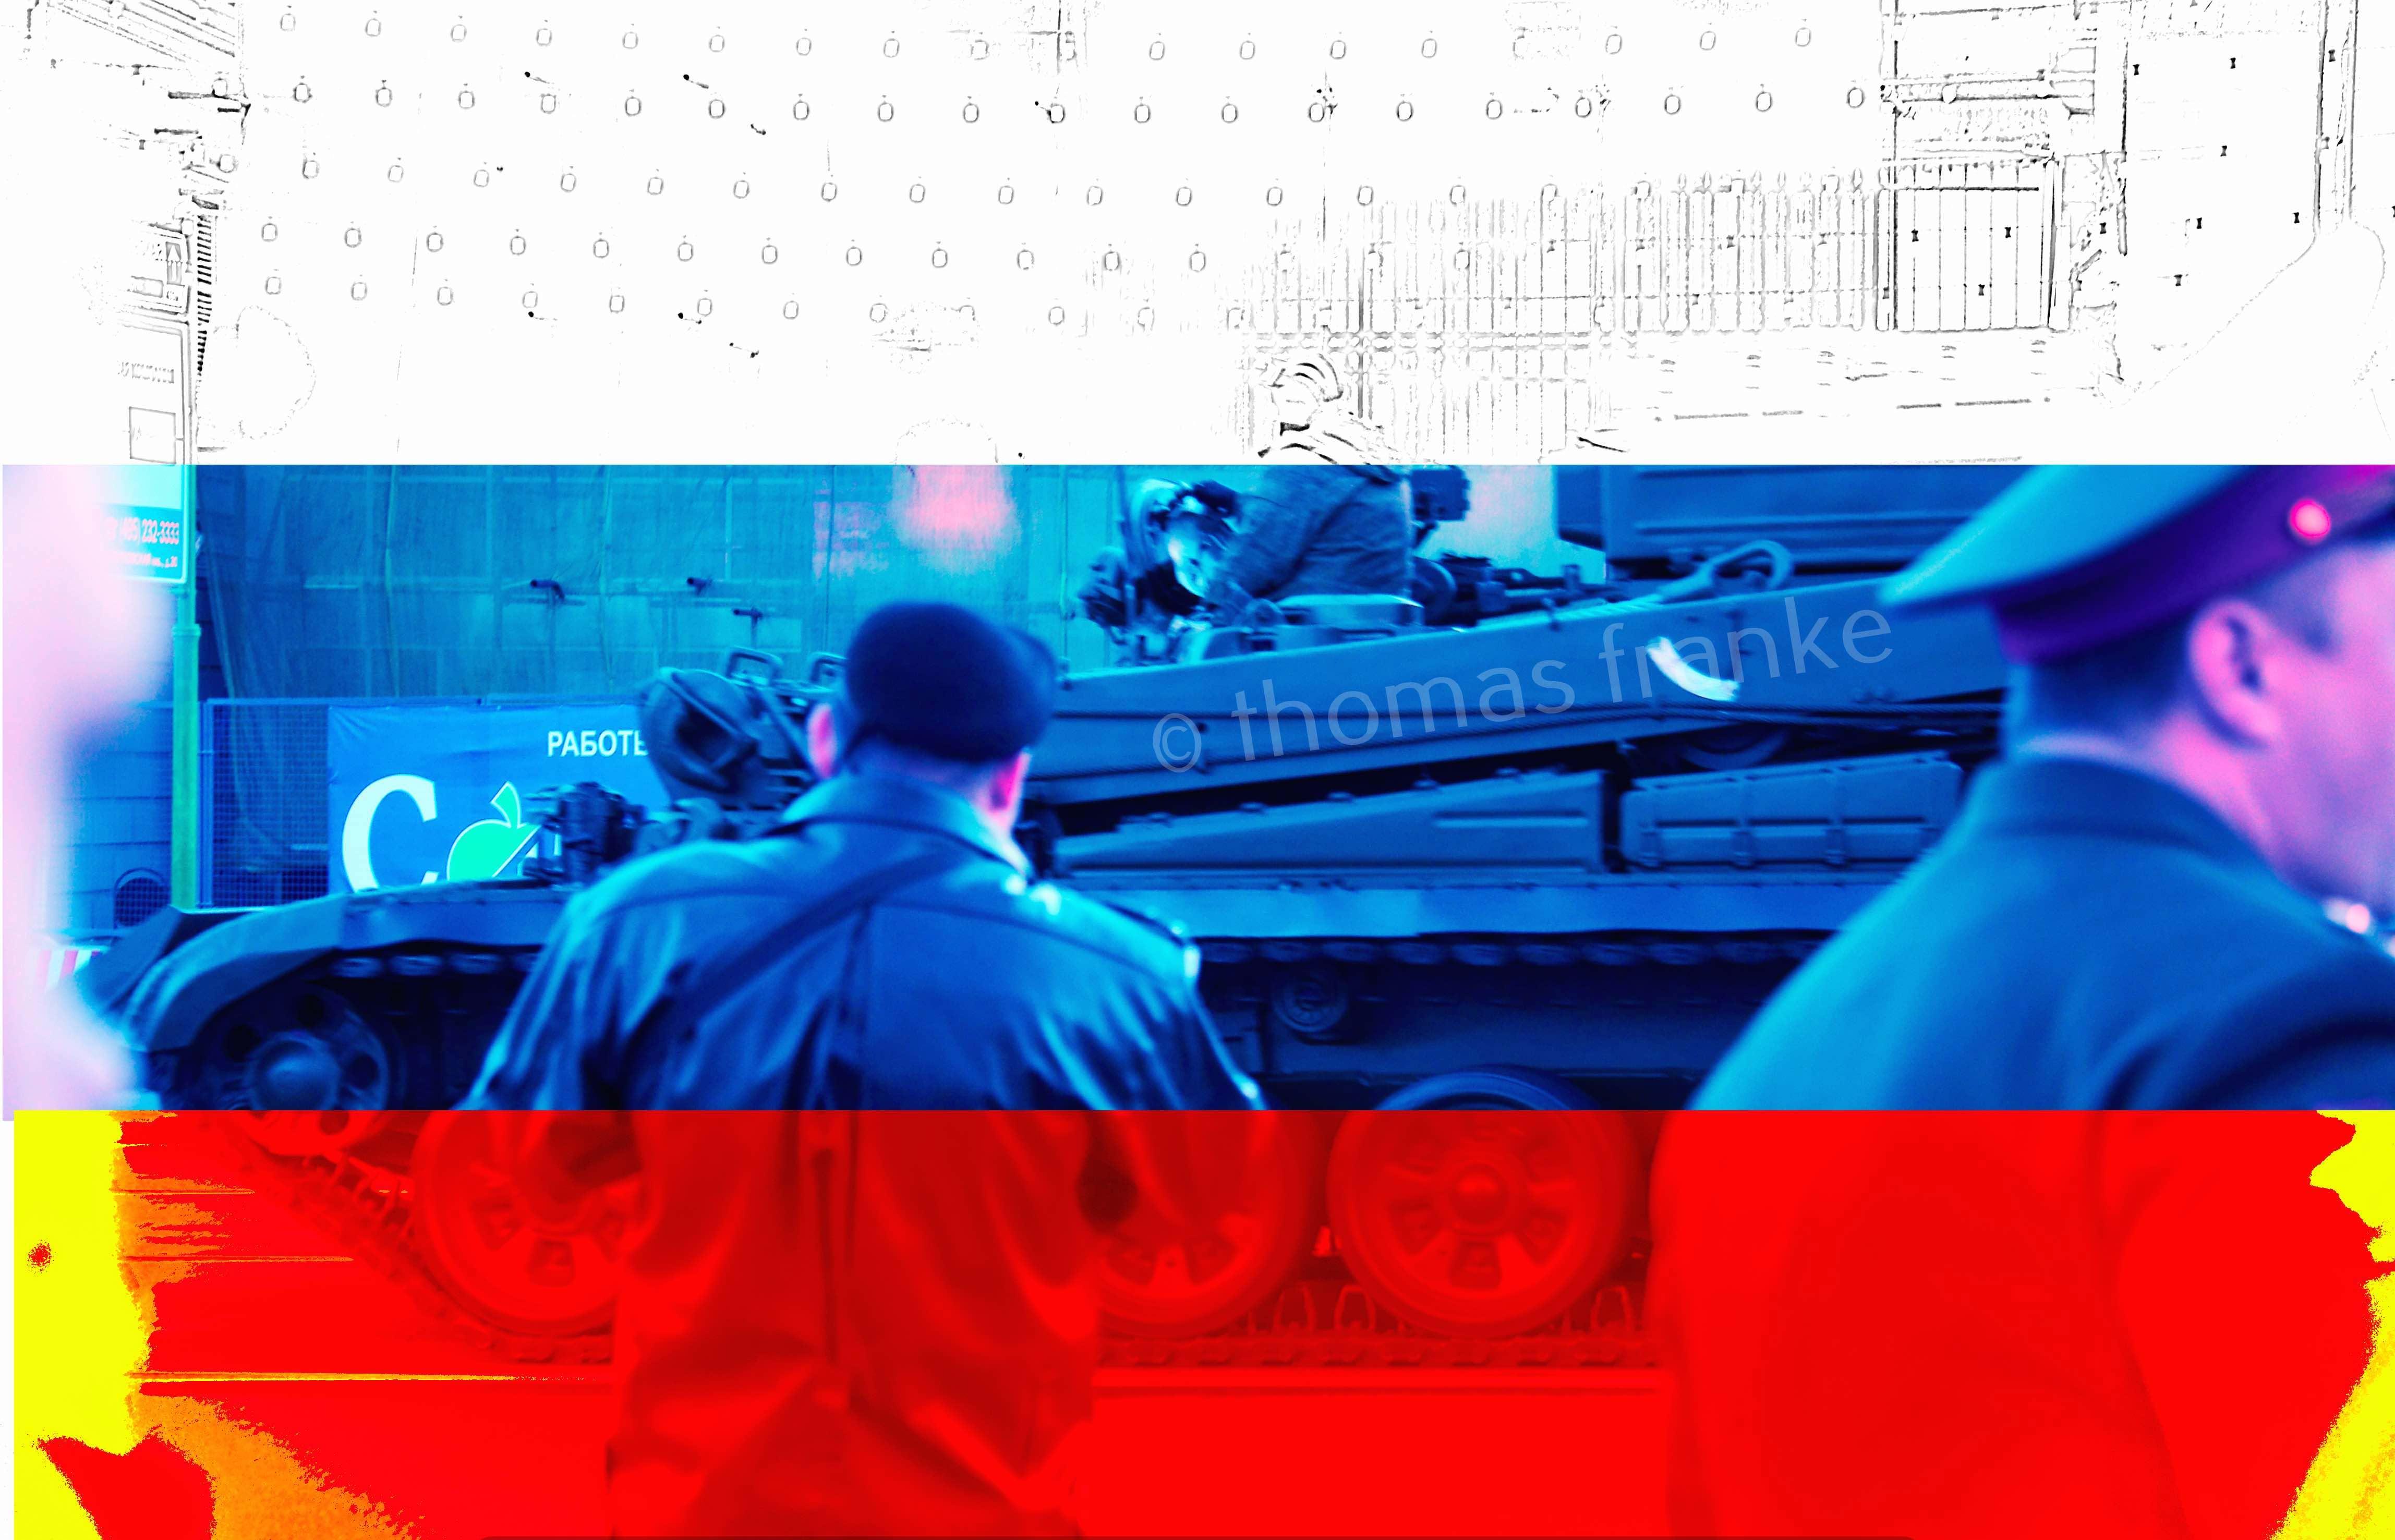 9. mai panzer vor mall flagge